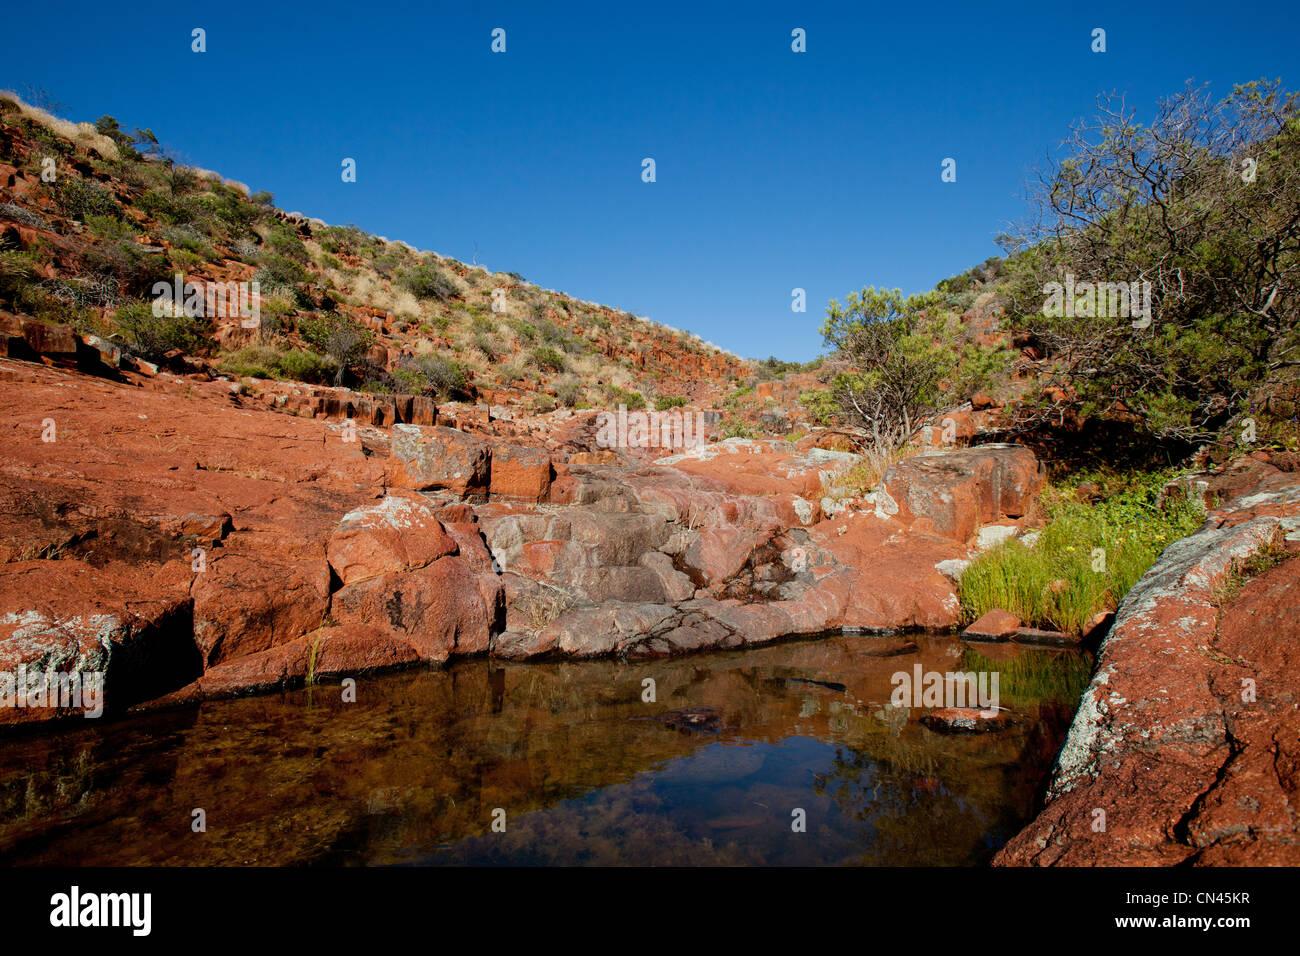 Piscine Rock Chaîne Gawler Australie du Sud Photo Stock